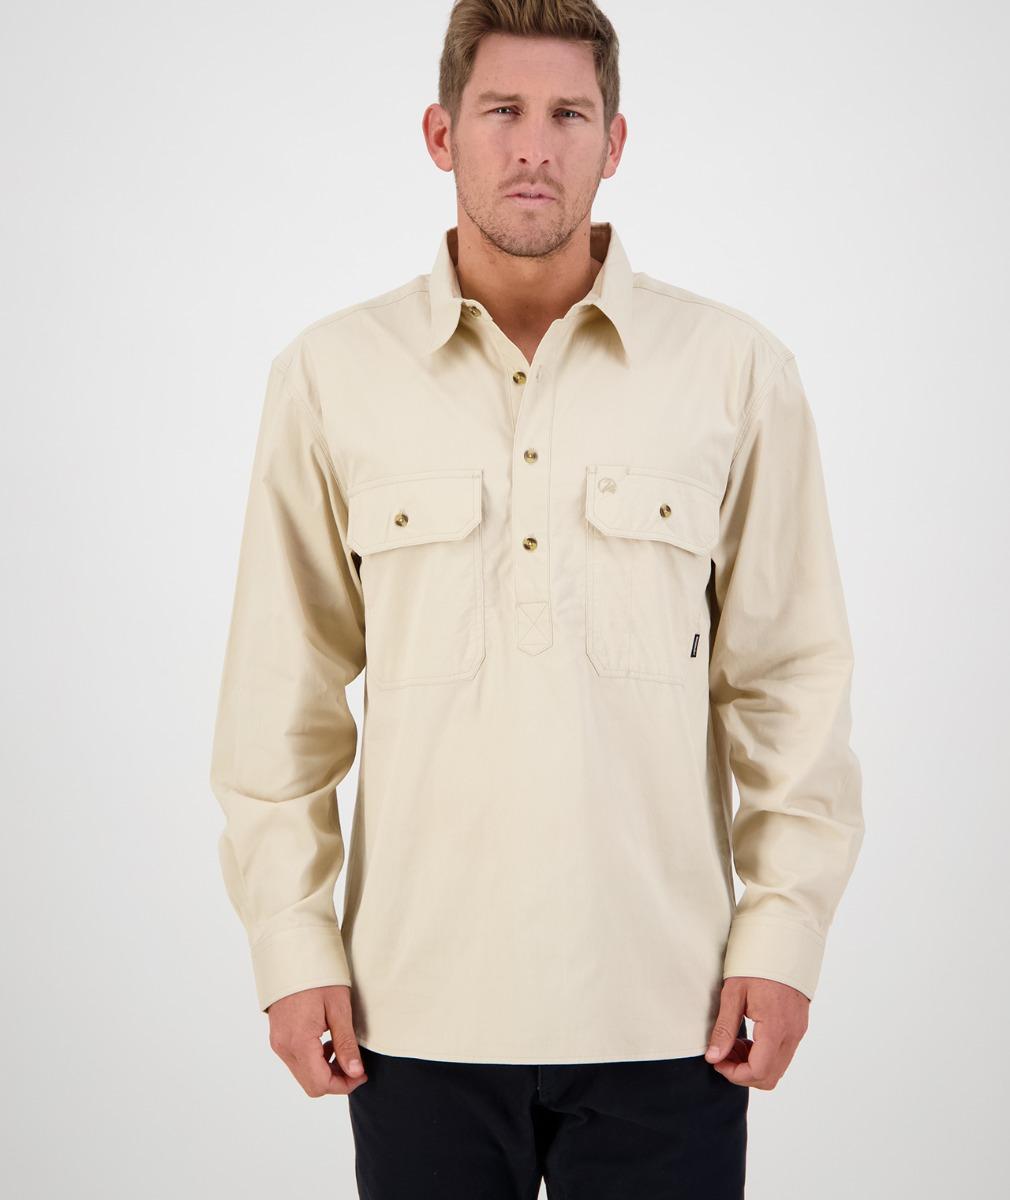 Swanndri Men's Bendigo Long Sleeve Work Shirt in Bone